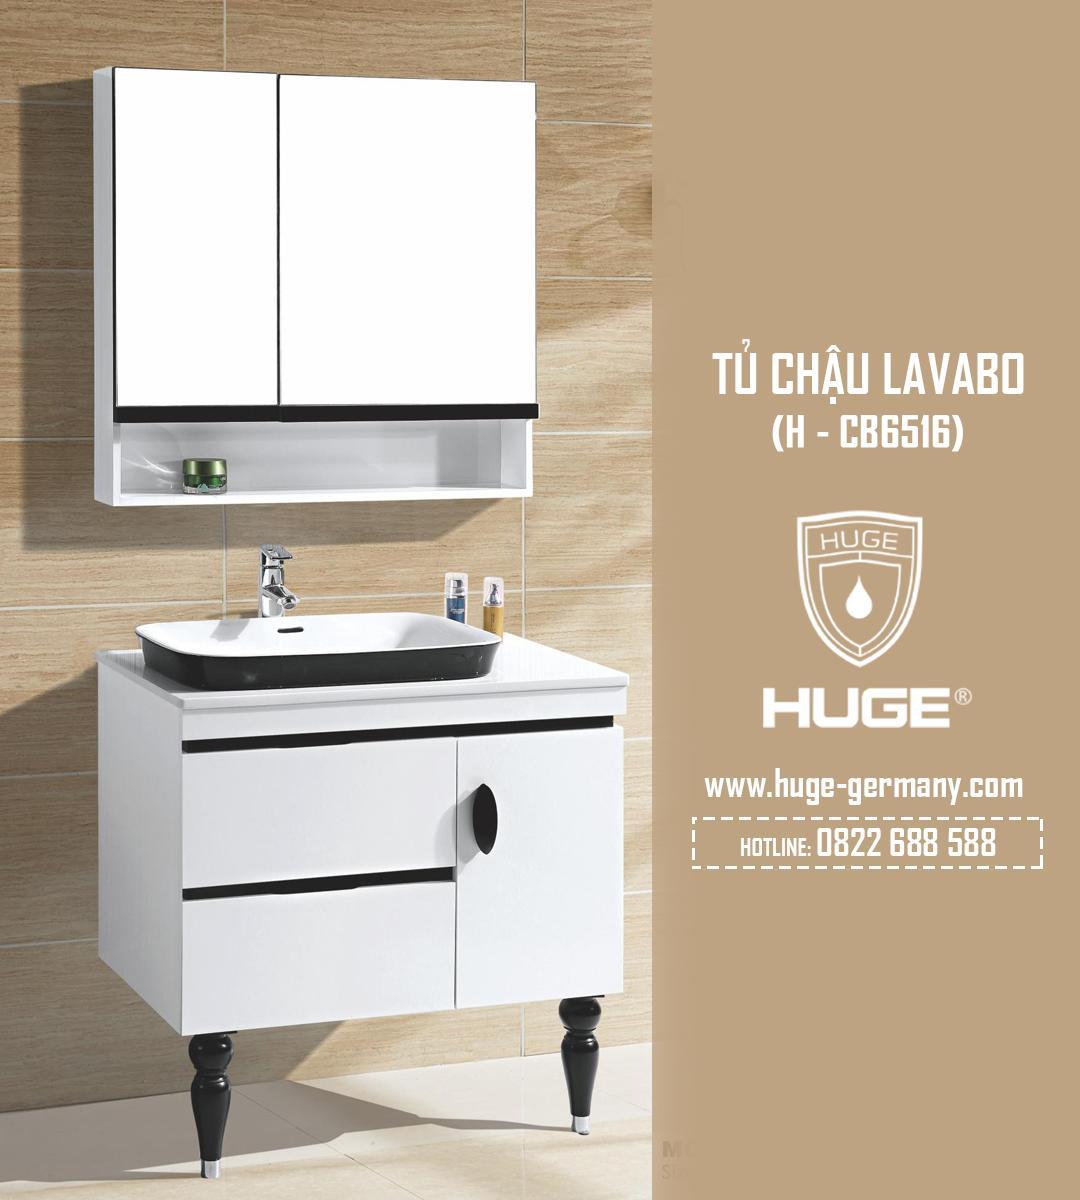 Tủ chậu lavabo 800 (H-CB6516)